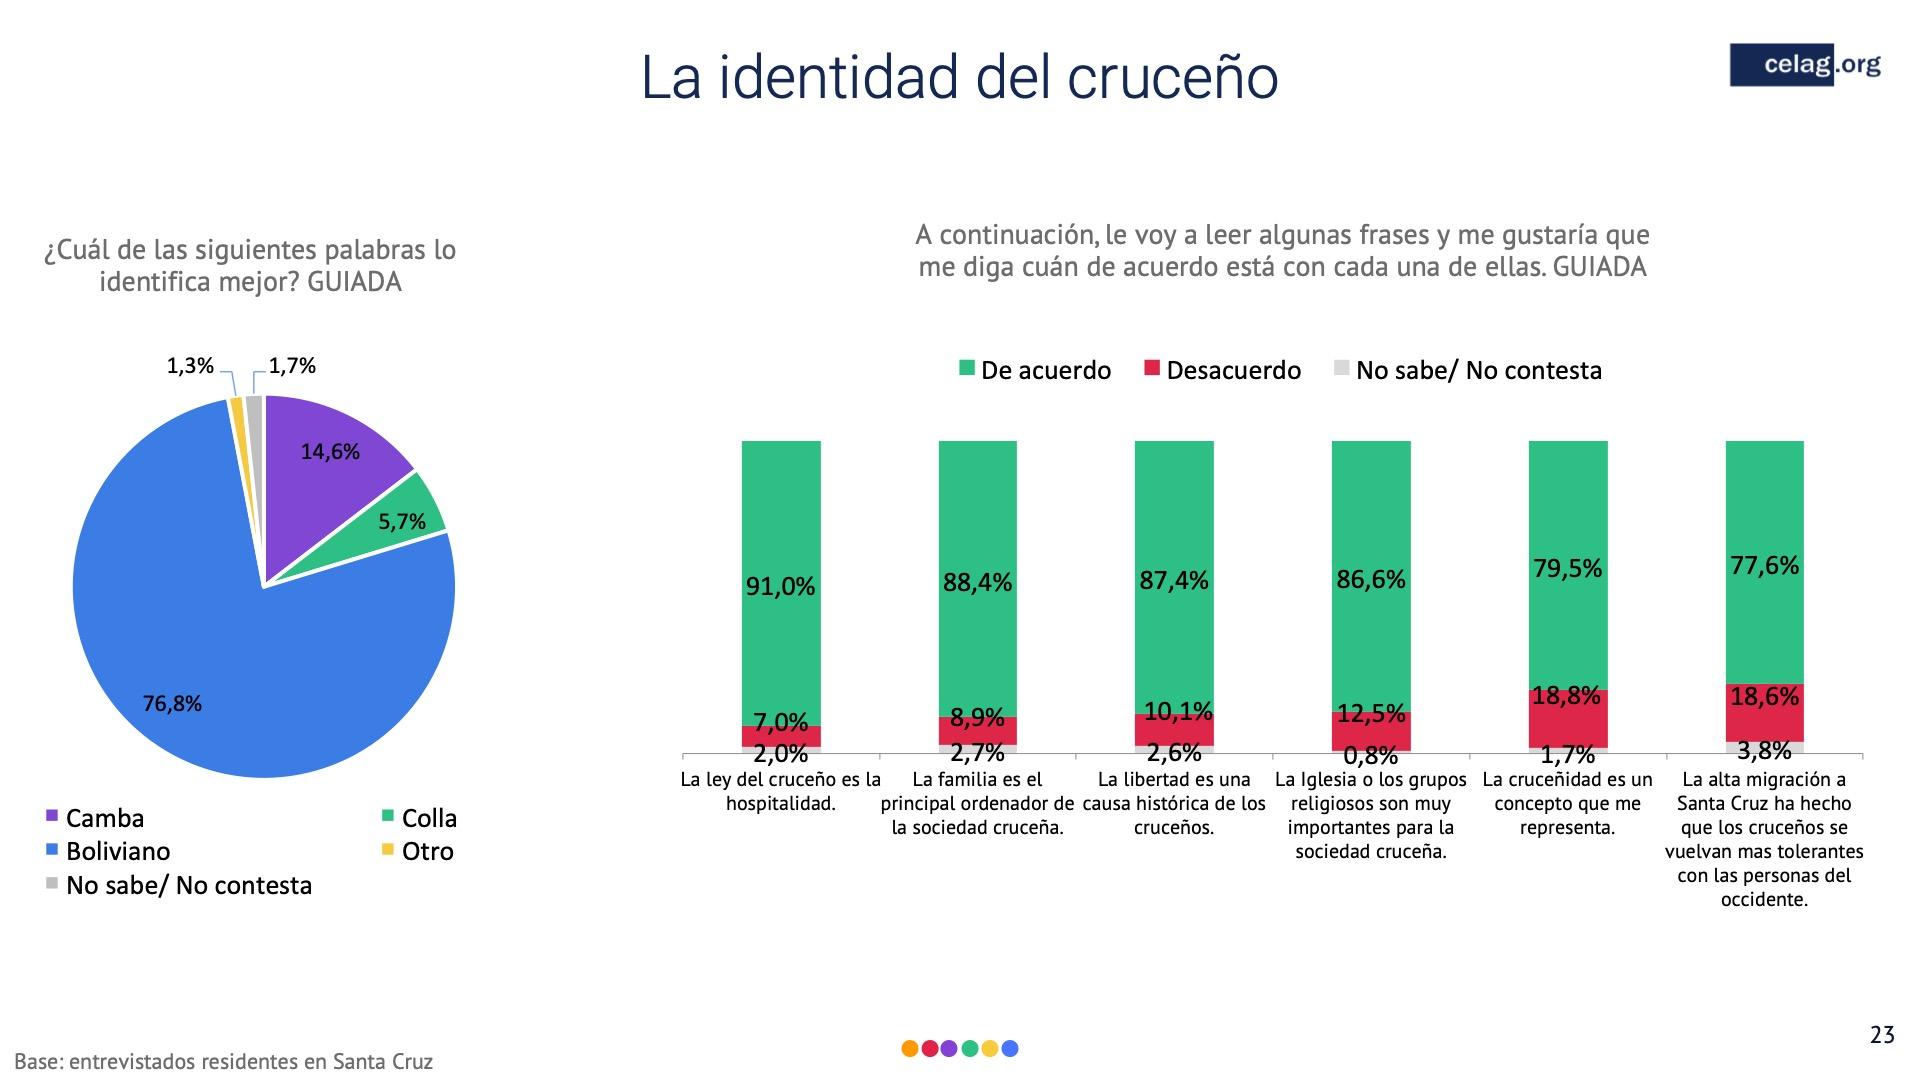 23 Elecciones bolivia la identidad del cruceno